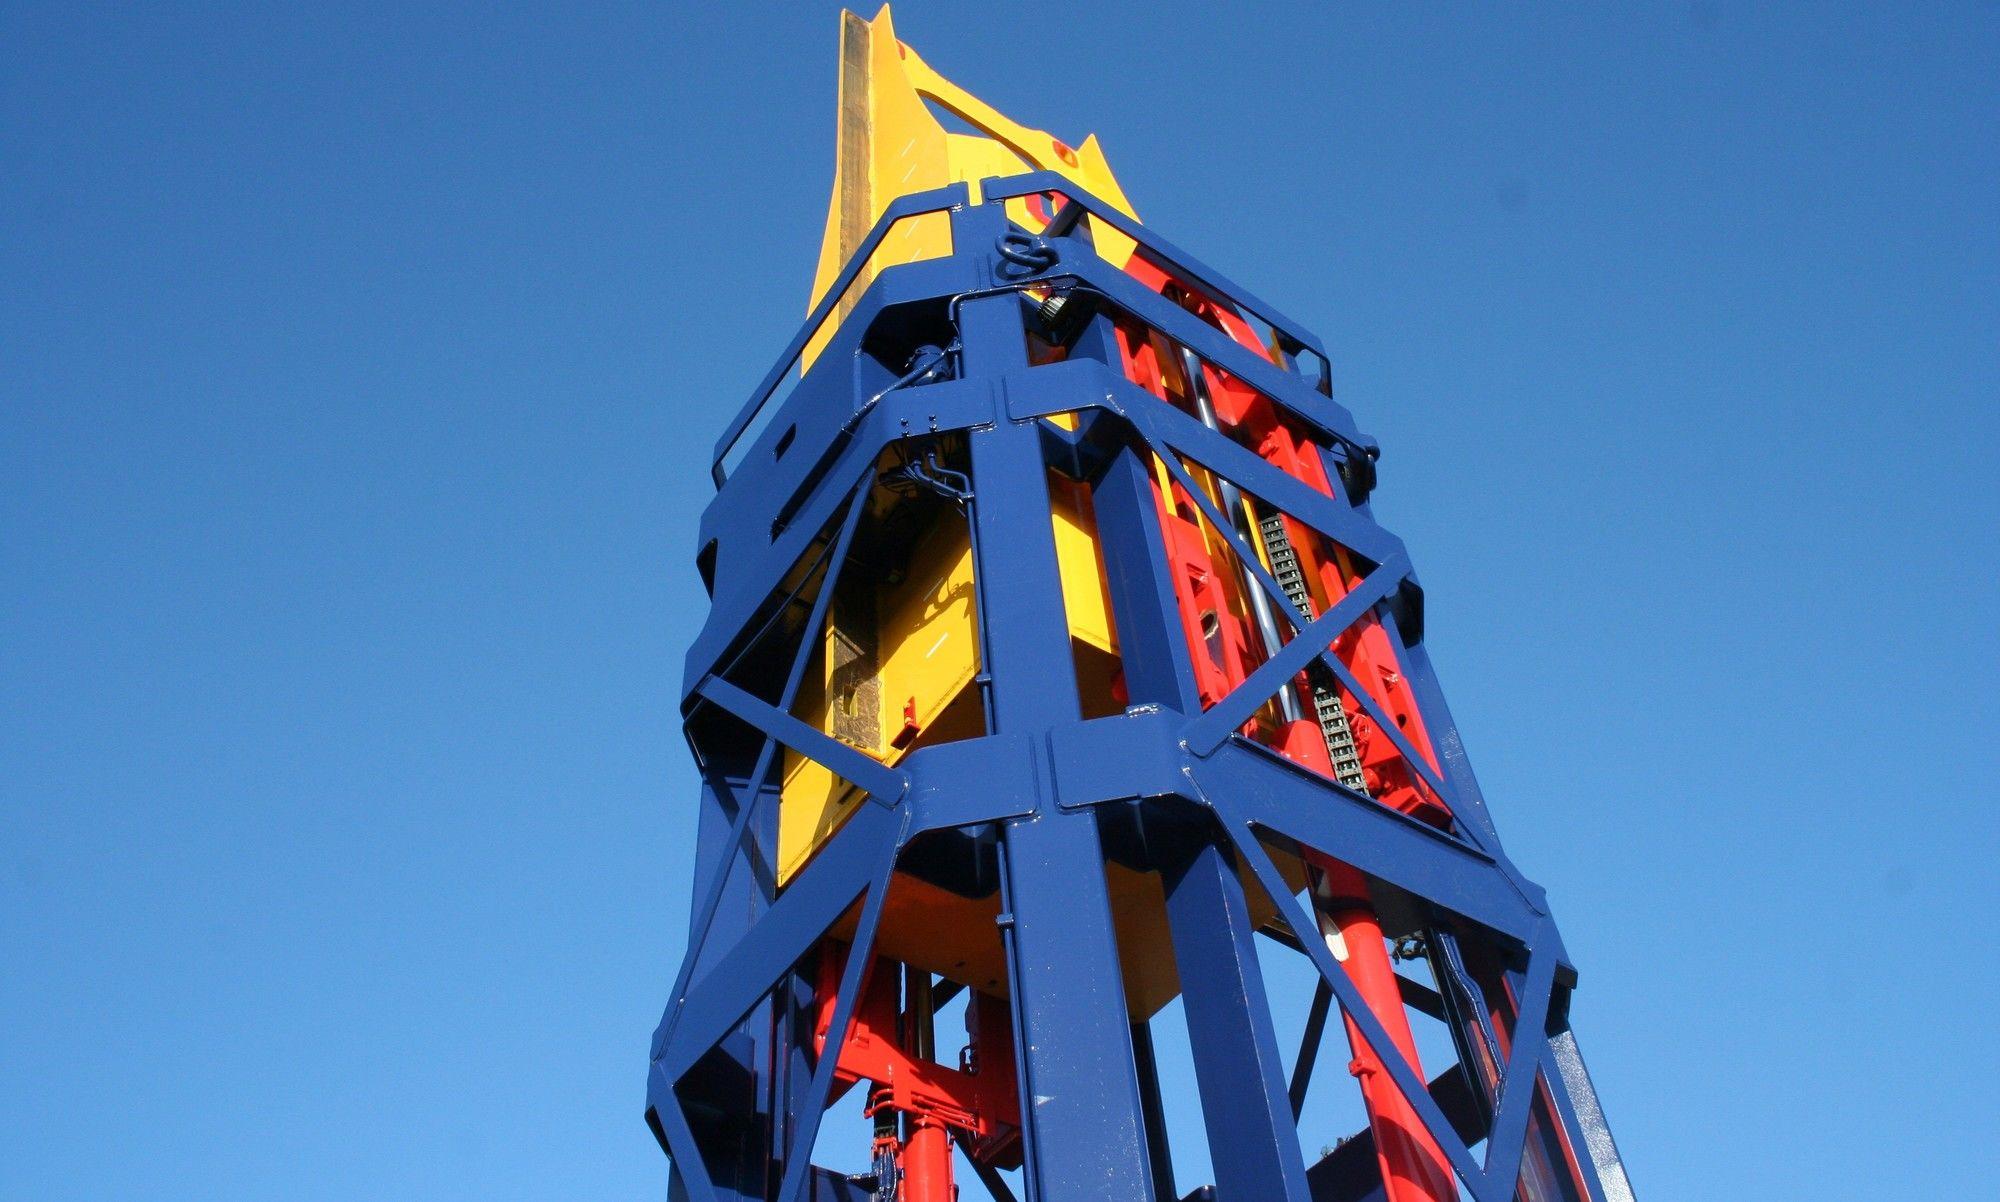 Cape Holland Shockload measurement